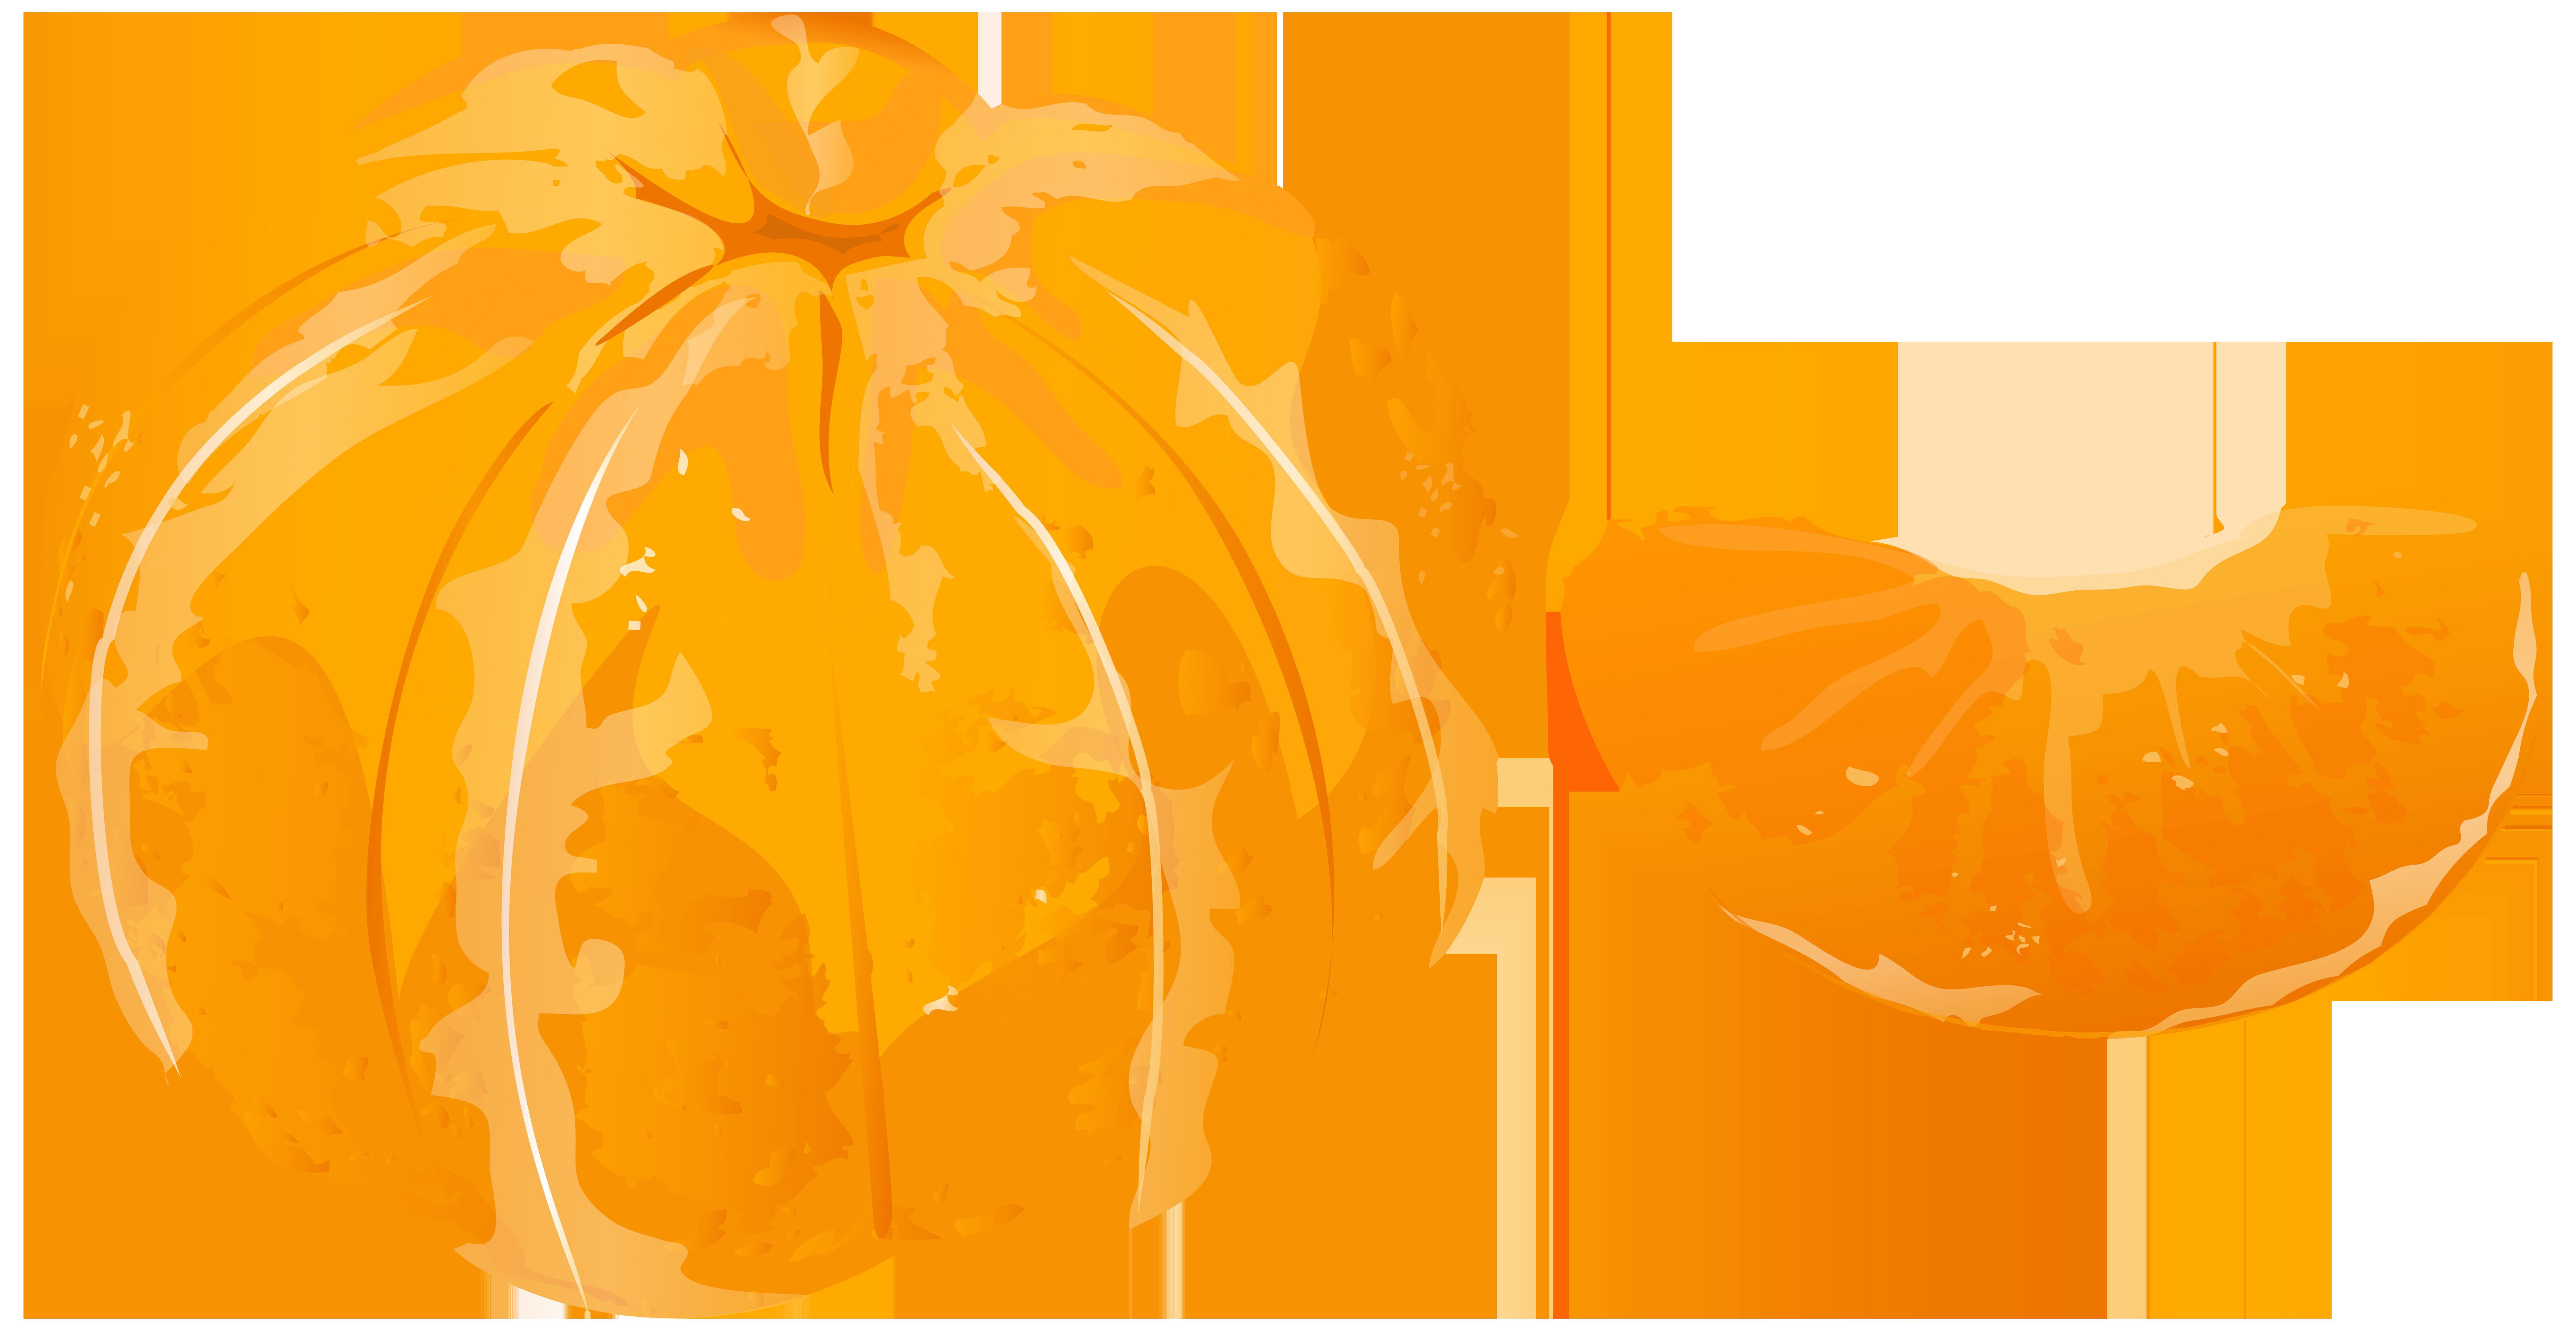 Pumpkin clipart chalkboard. Peeled mandarin transparent png